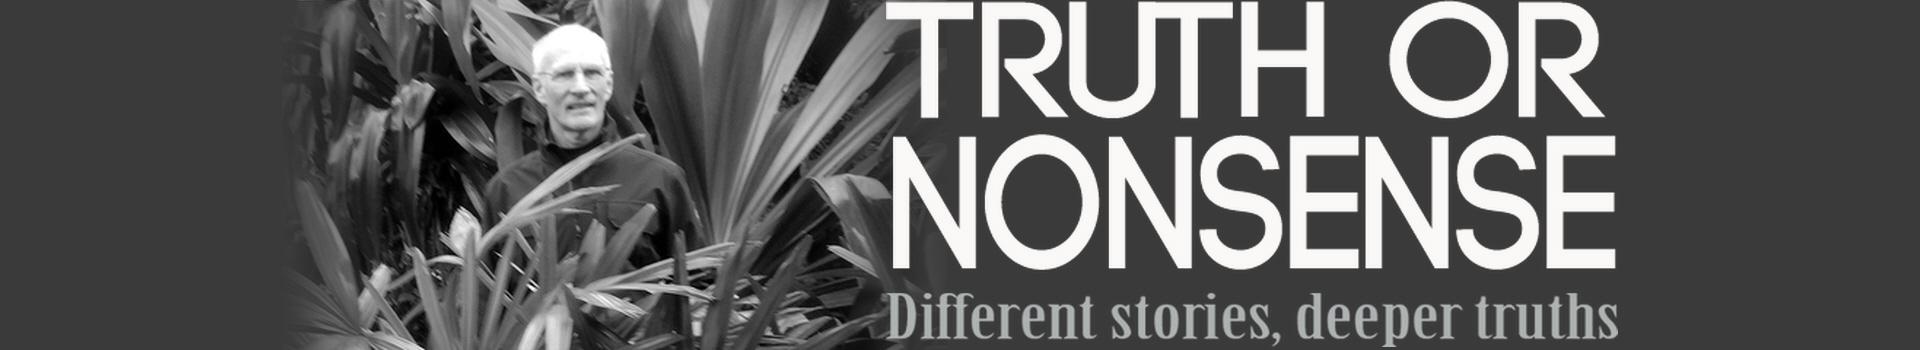 Truth or Nonsense